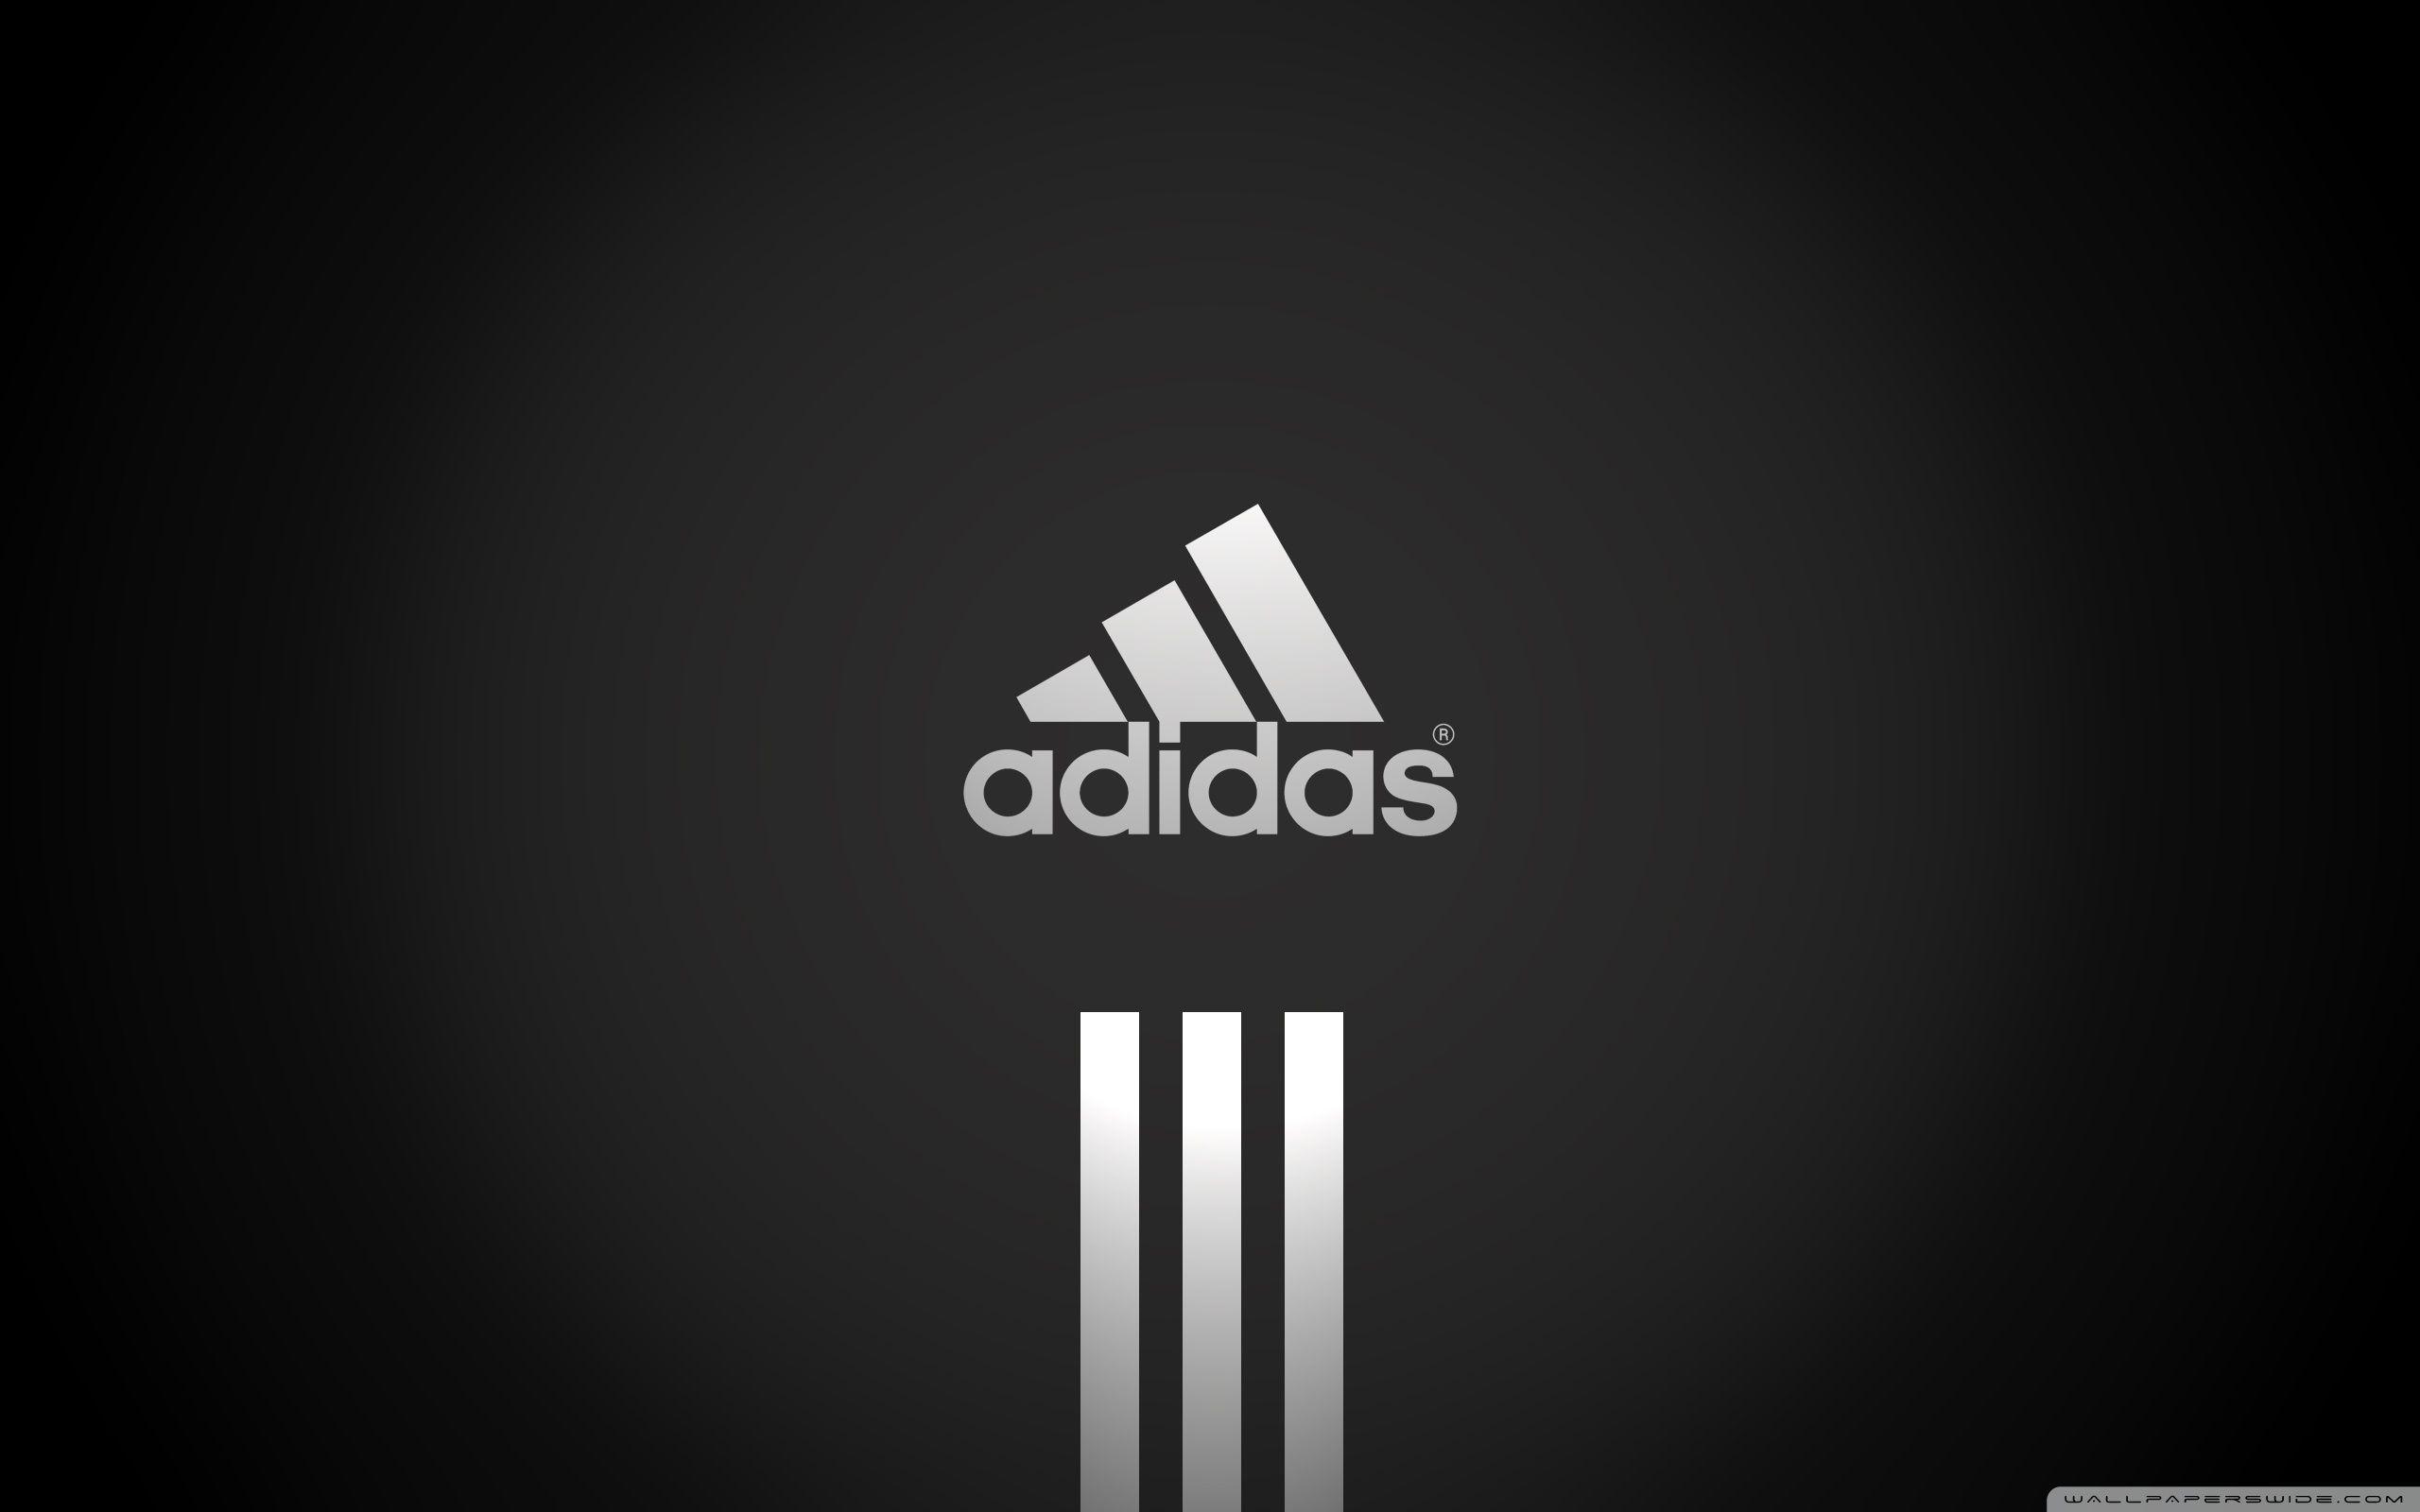 Adidas 4k Wallpapers Top Free Adidas 4k Backgrounds Wallpaperaccess Adidas Logo Wallpapers Adidas Wallpapers Adidas Logo